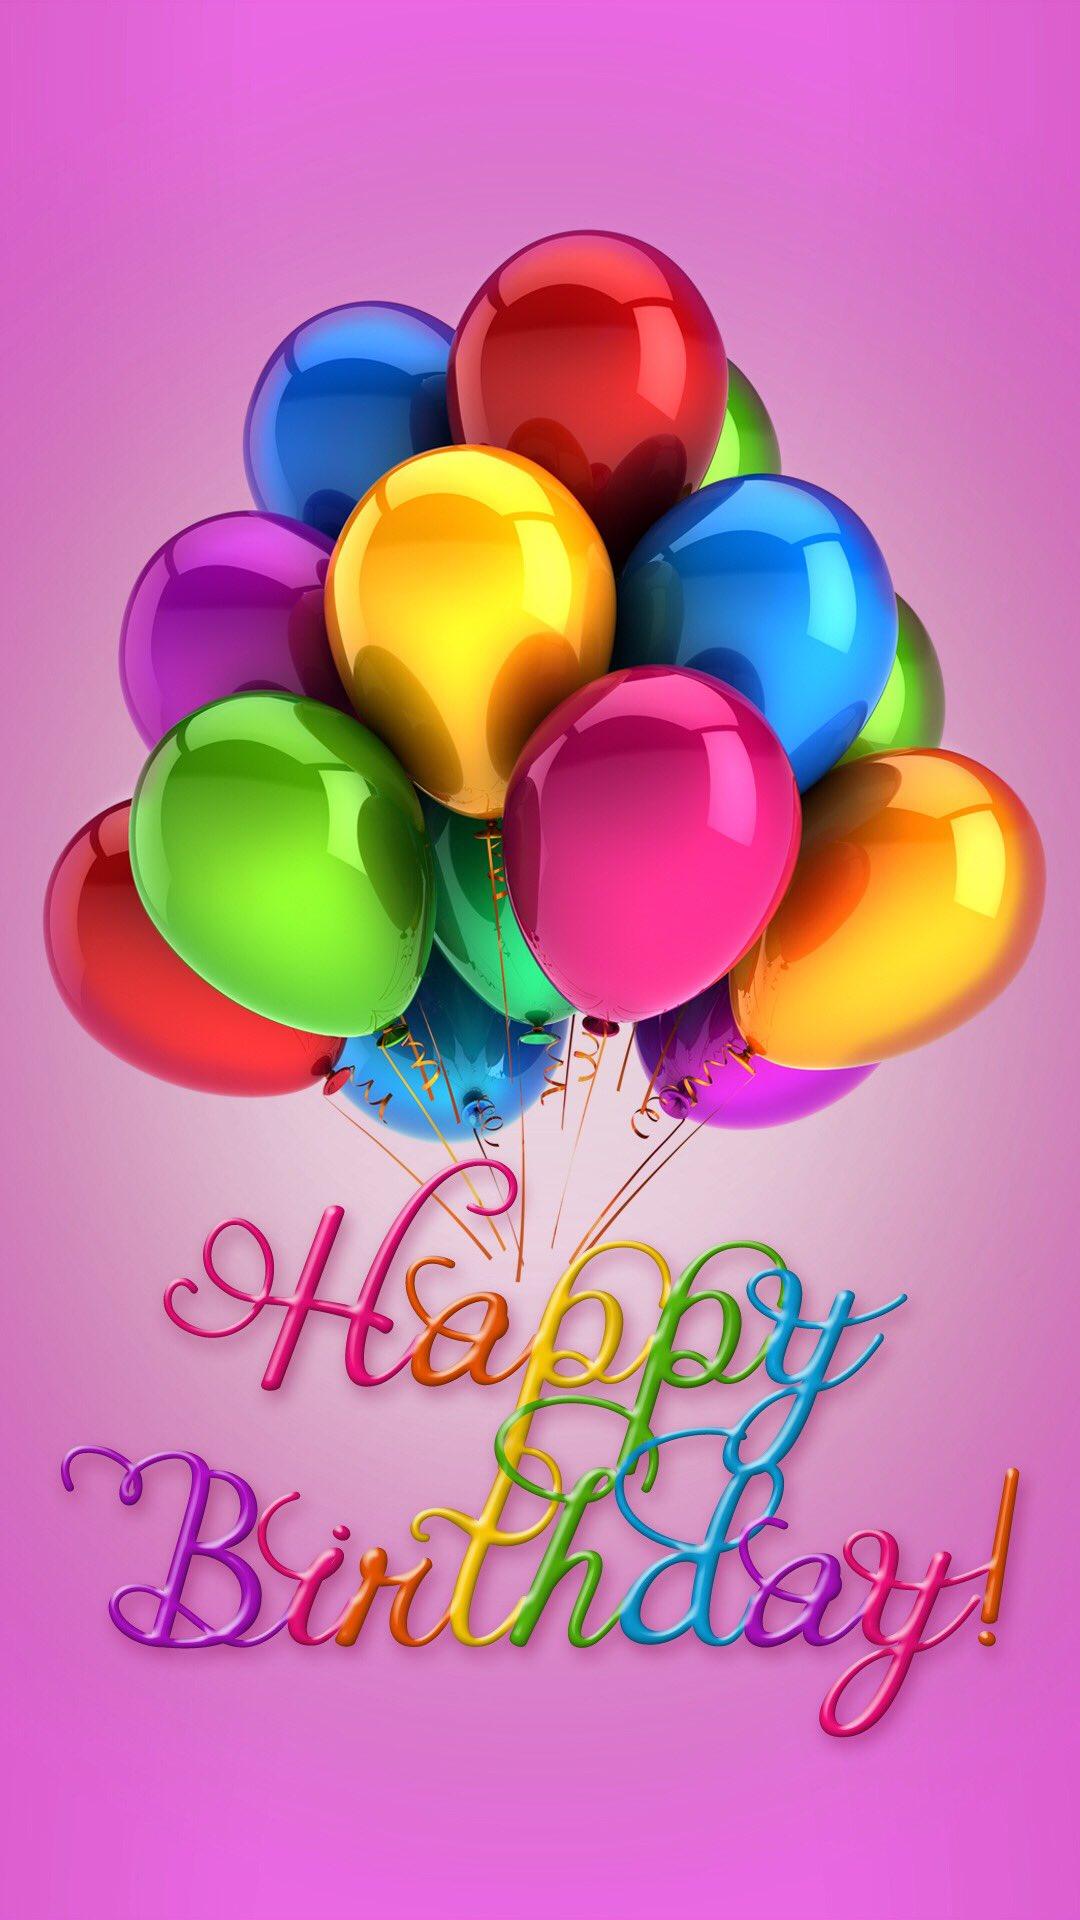 Happy Birthday Kelly Rowland!!!